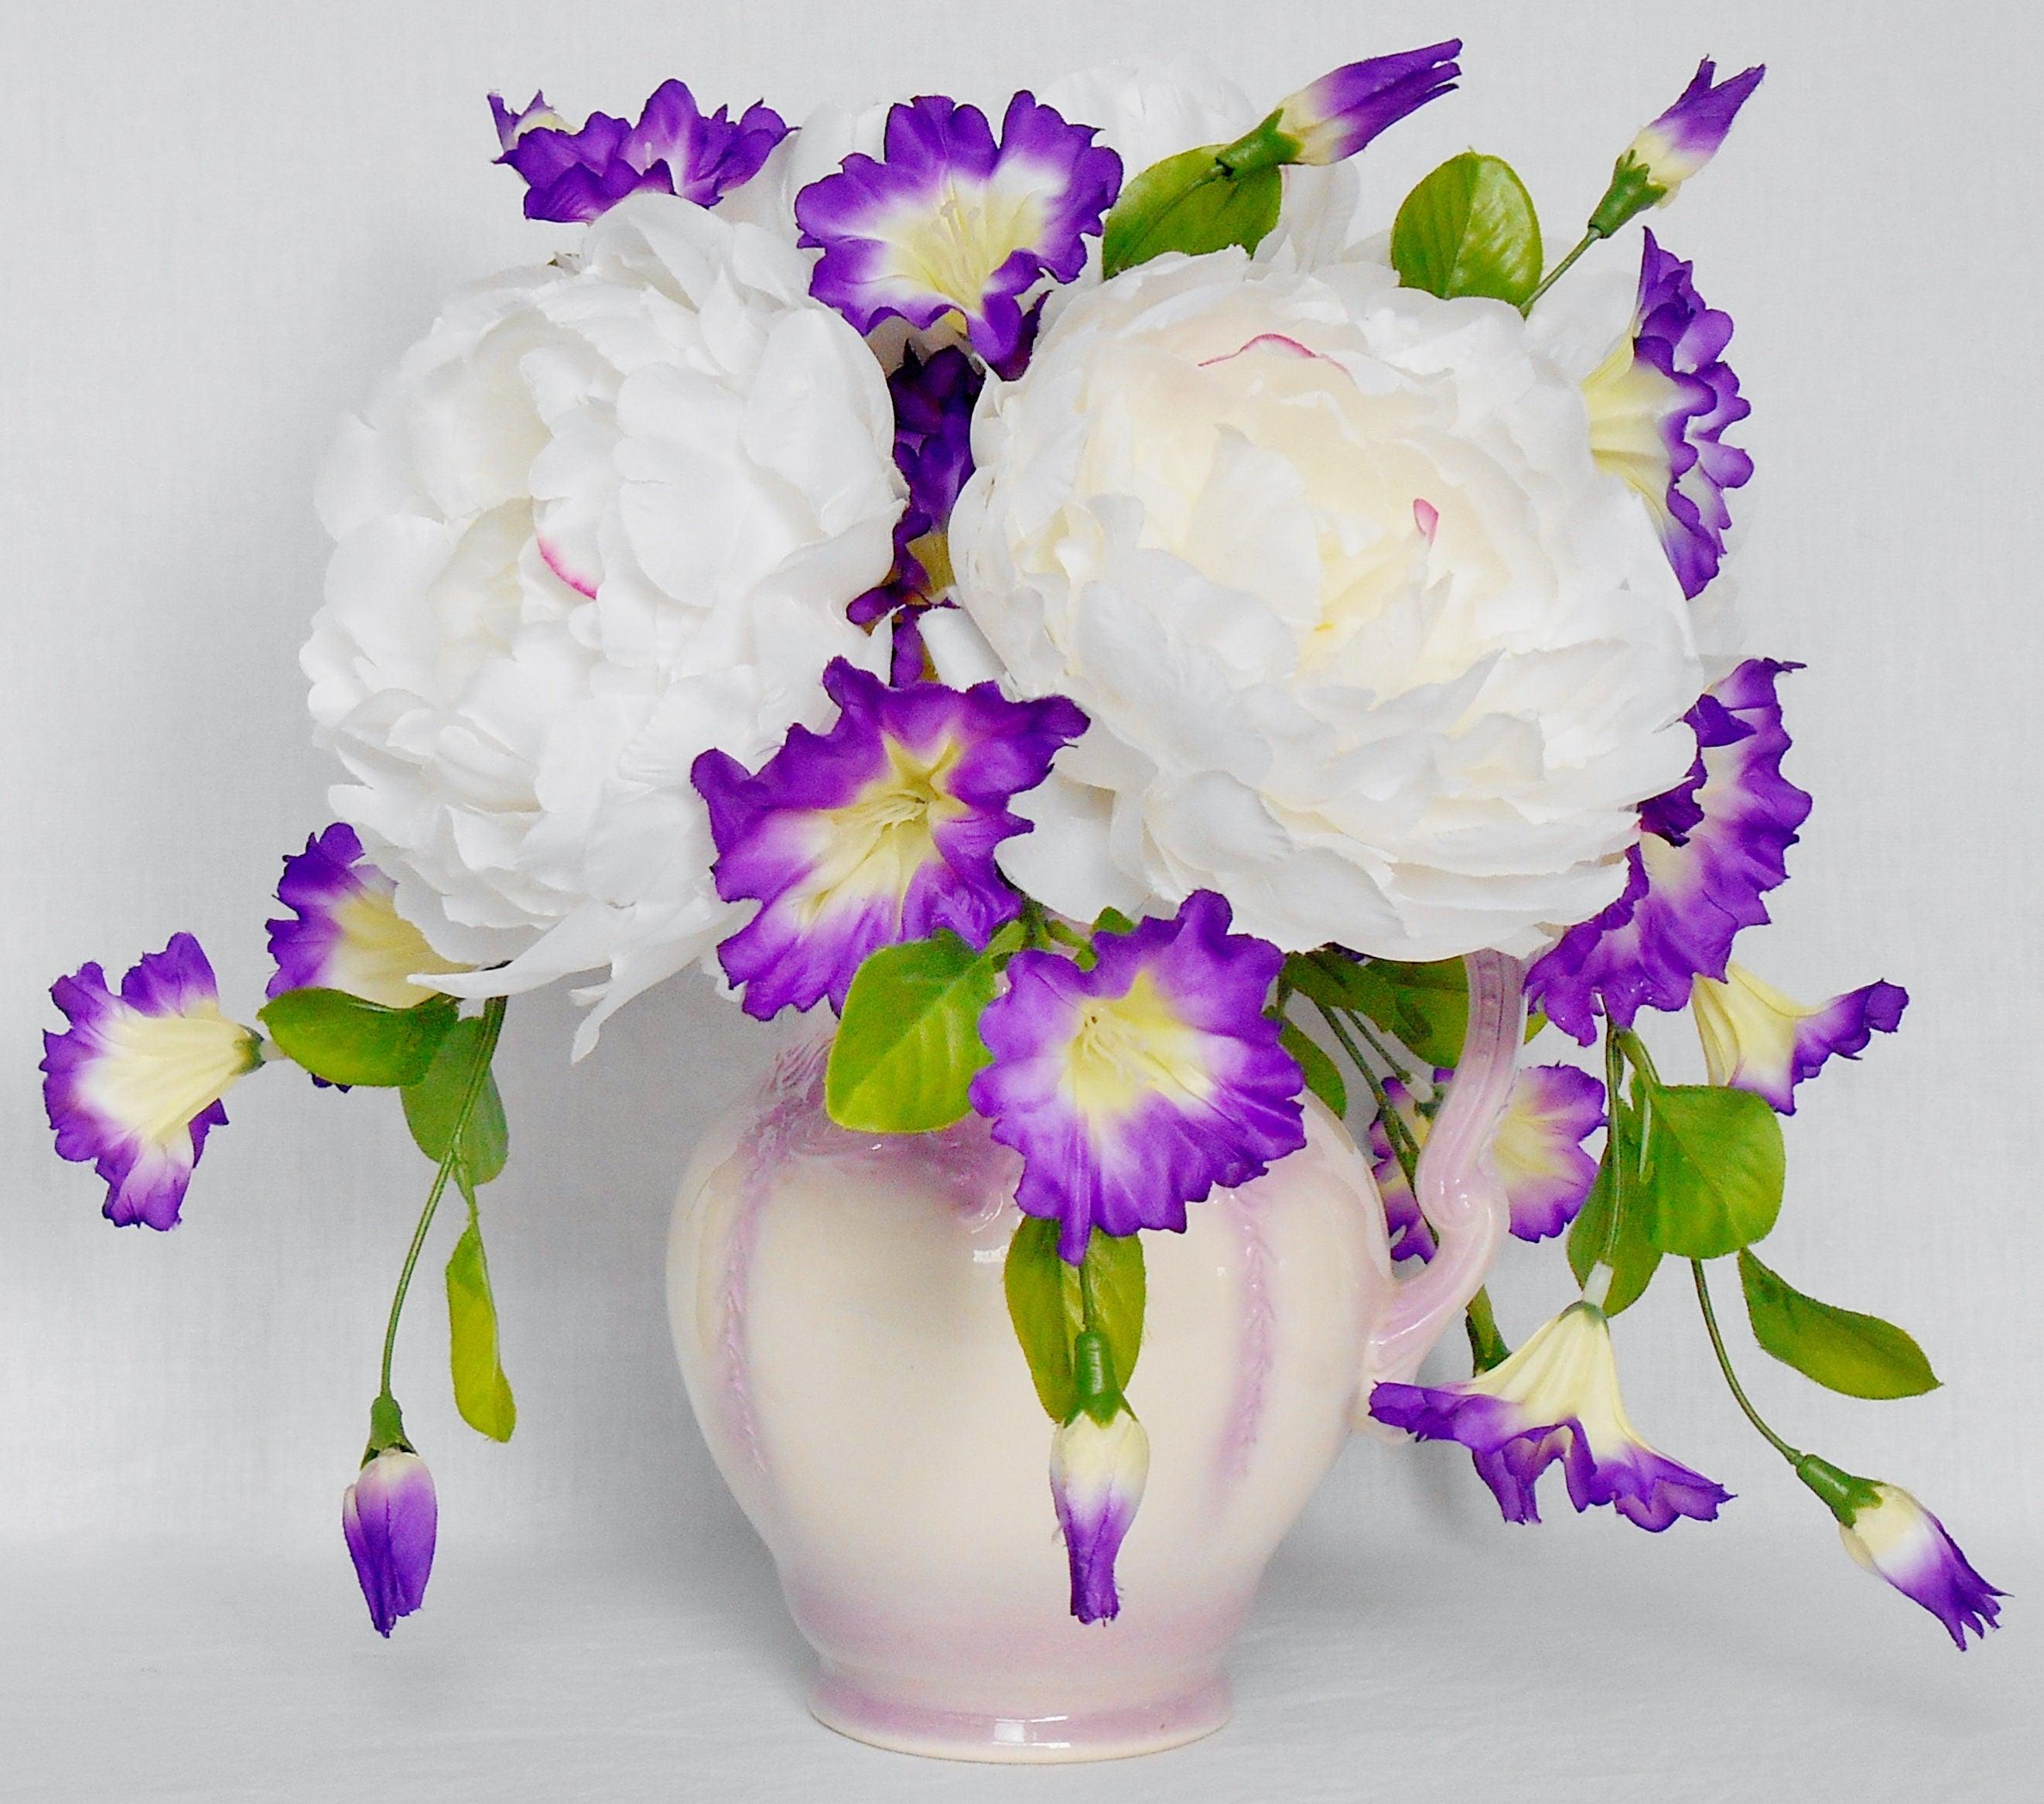 Artificial Flower Arrangement White Silky Peonies Purple